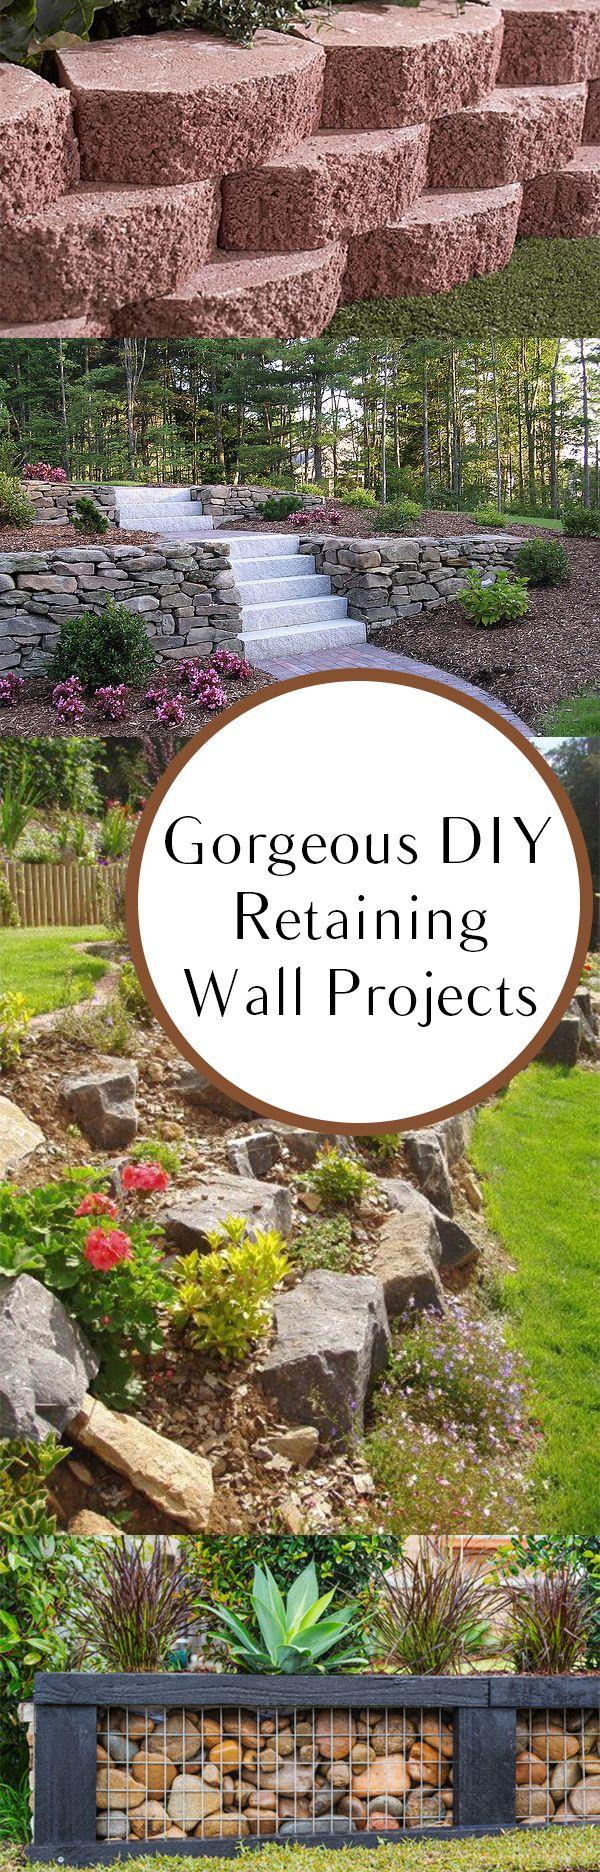 Garden decor projects - Diy Retaining Walls Diy Garden Decorgarden